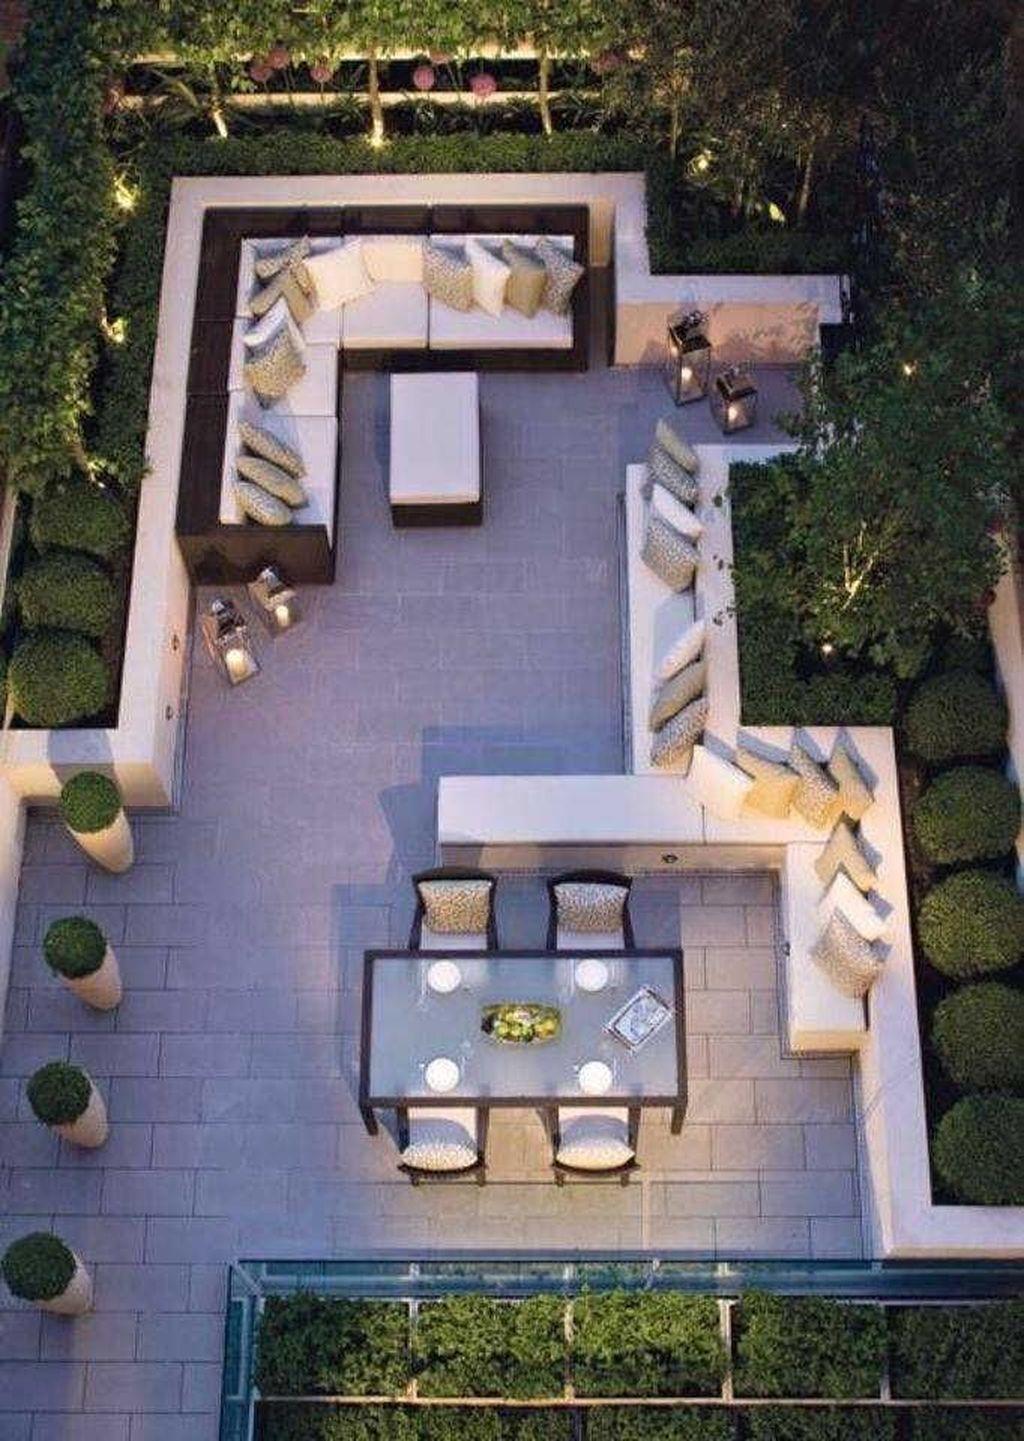 Get Your Outdoor Decor Design In Check For This Summer Sunsets Projeto Paisagistico Para O Quintal Quintal Moderno Projetos De Quintal